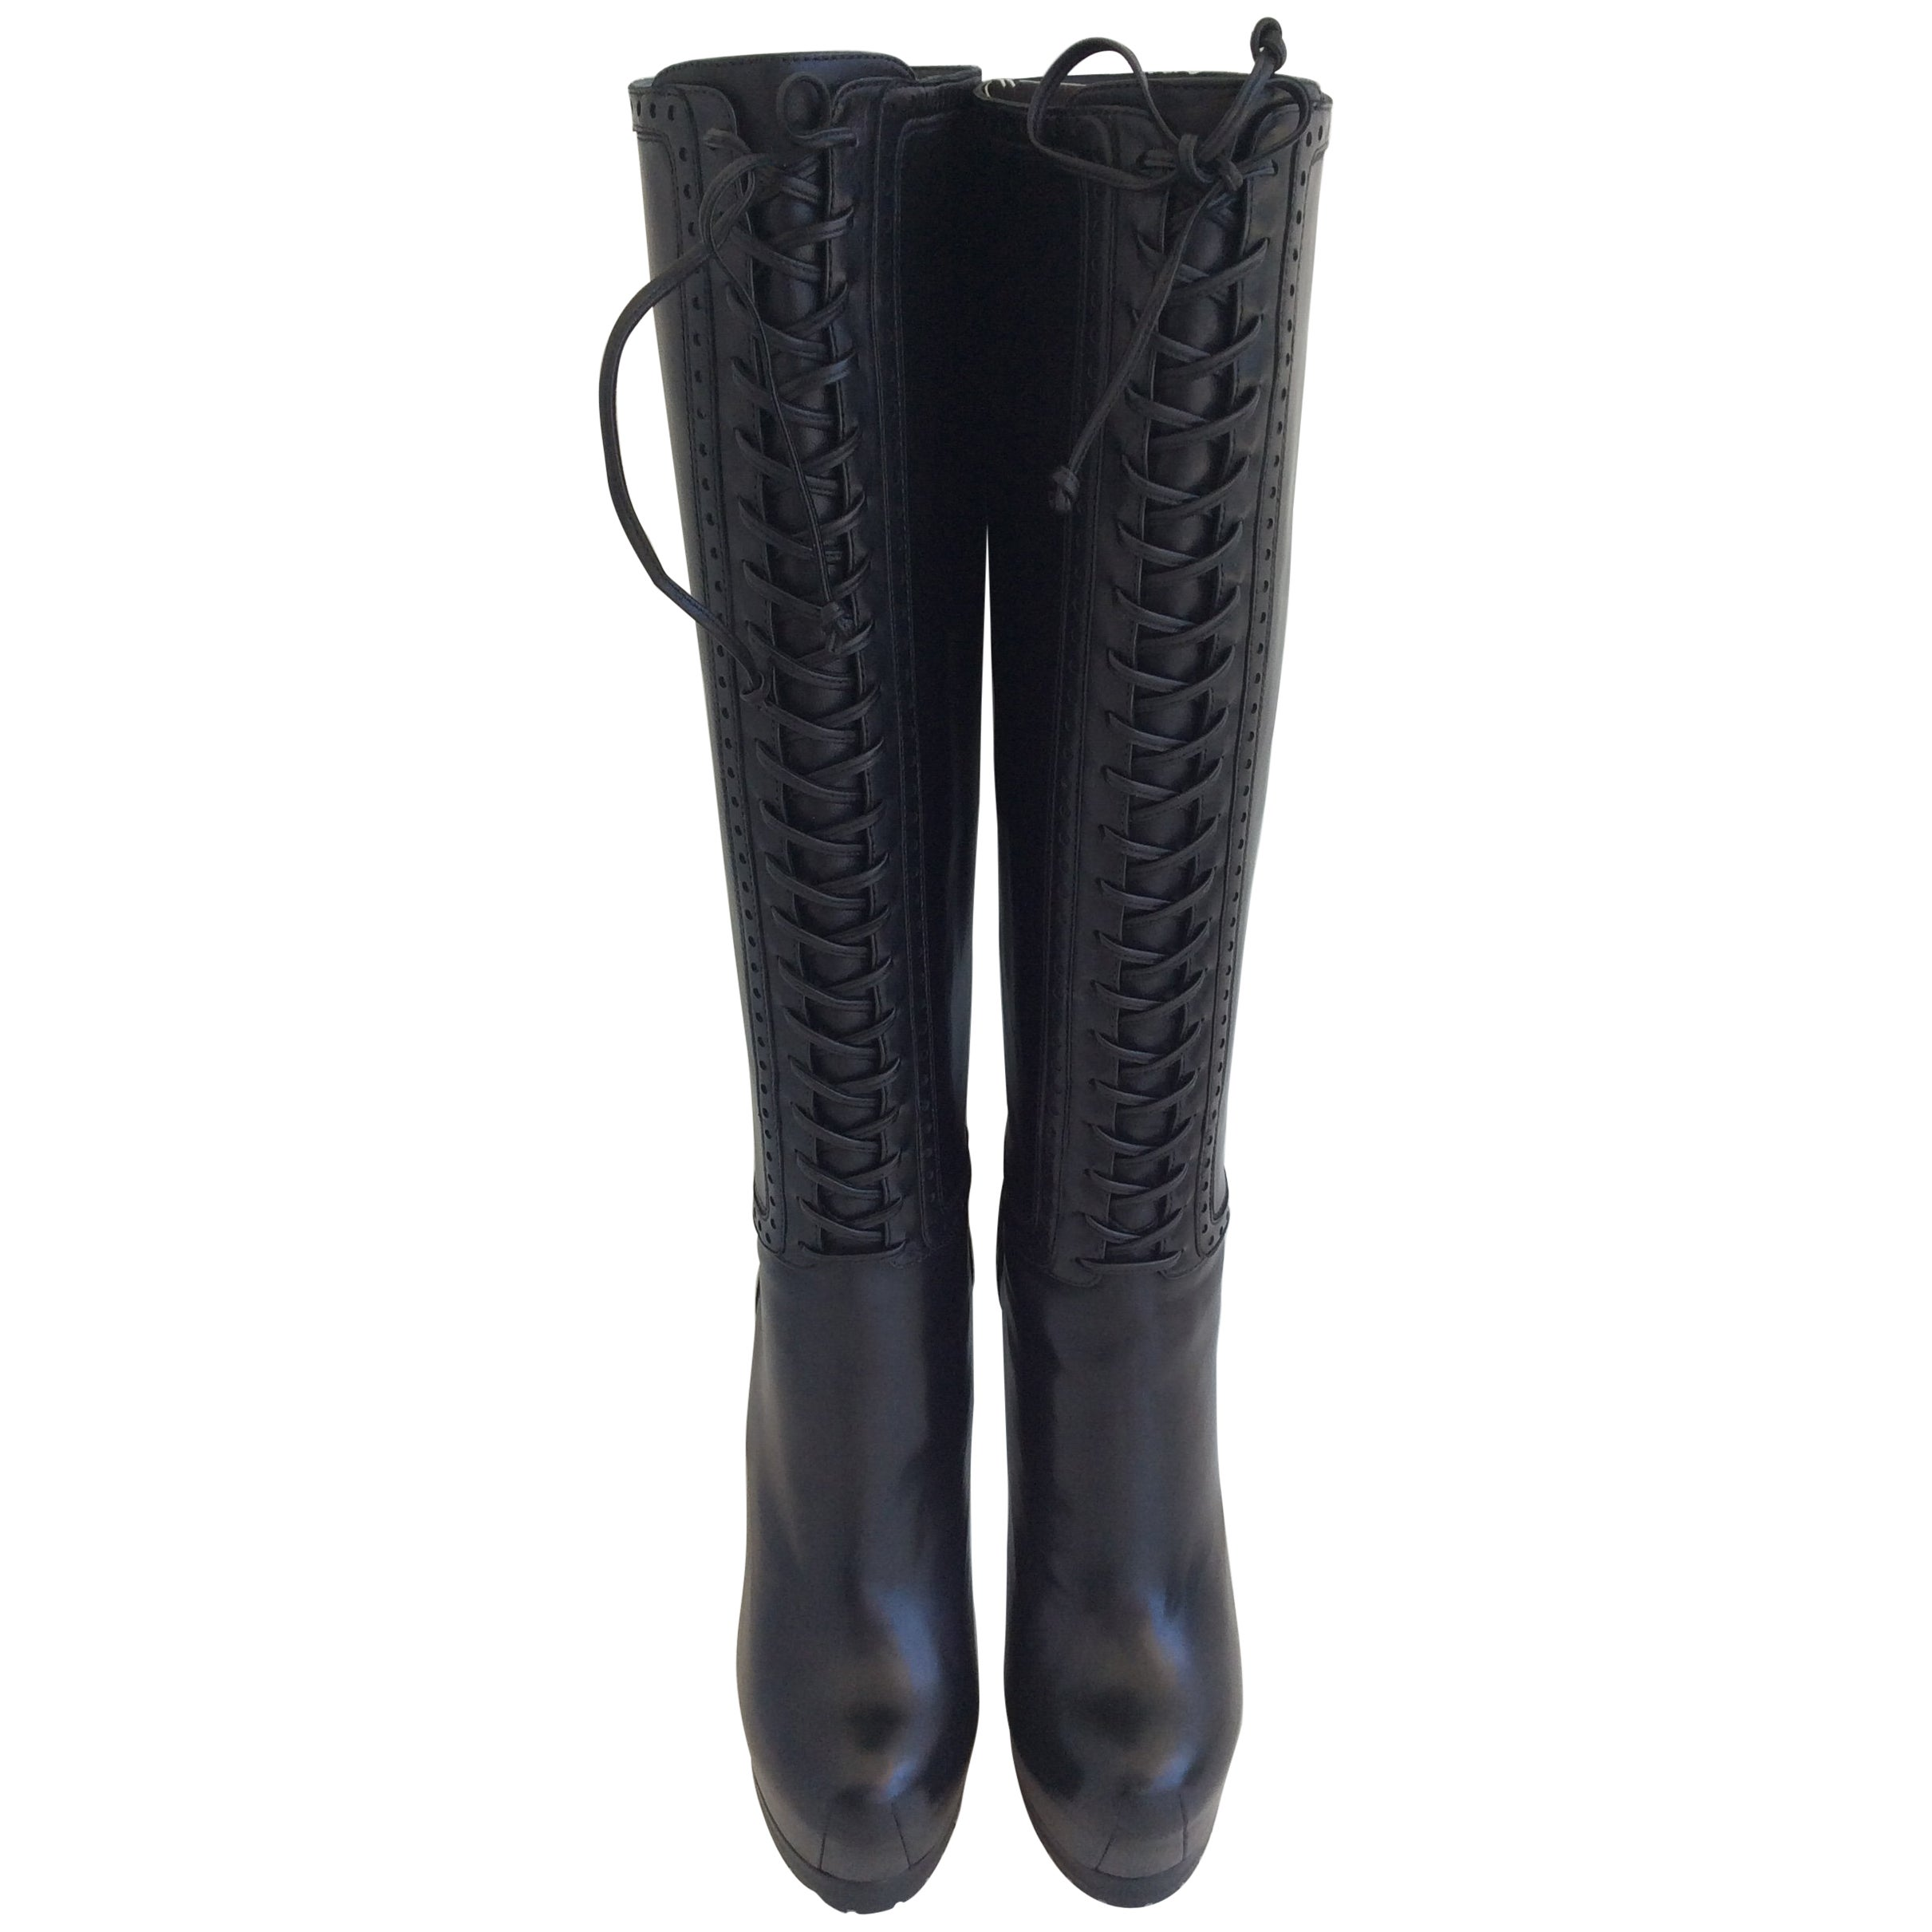 6117967bdf85 Yves Saint Laurent Black Leather Tribute Lace Up Platform Boots For Sale at  1stdibs